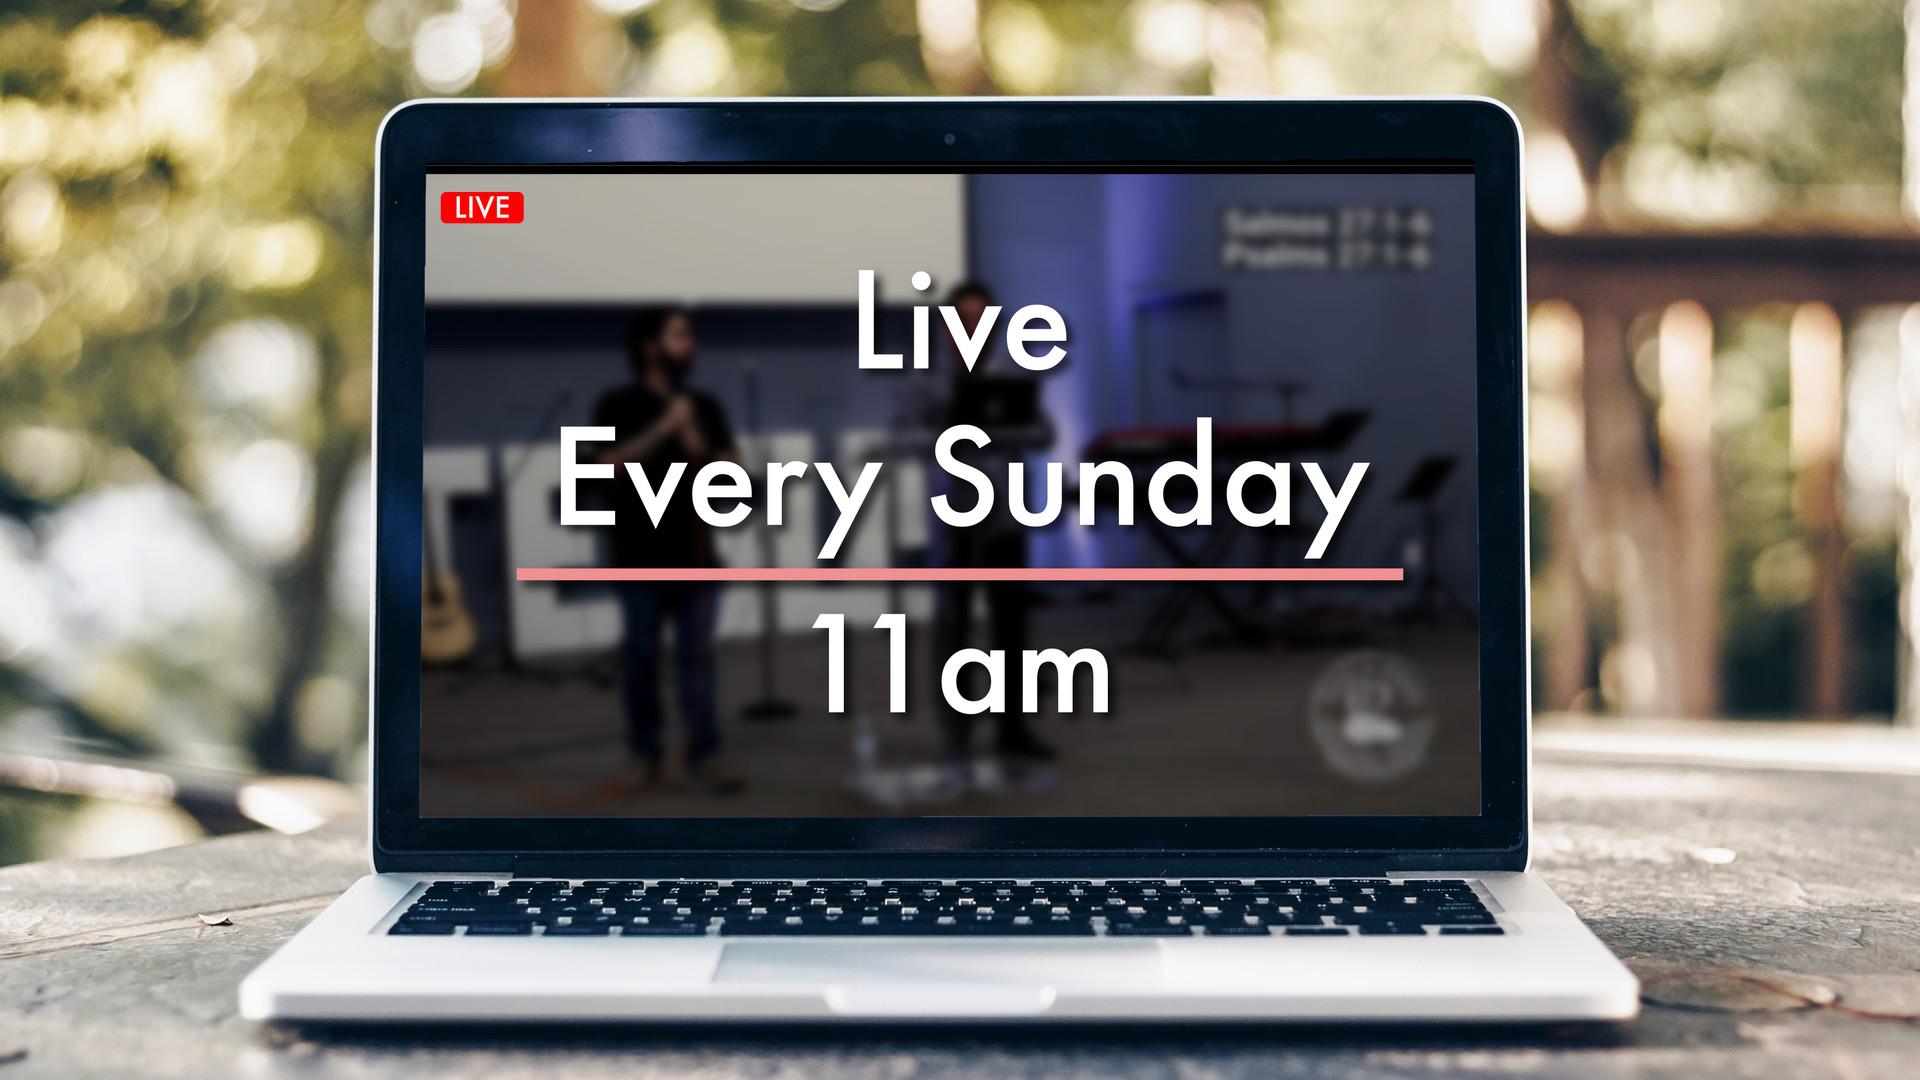 LiveEverySunday-01.jpg